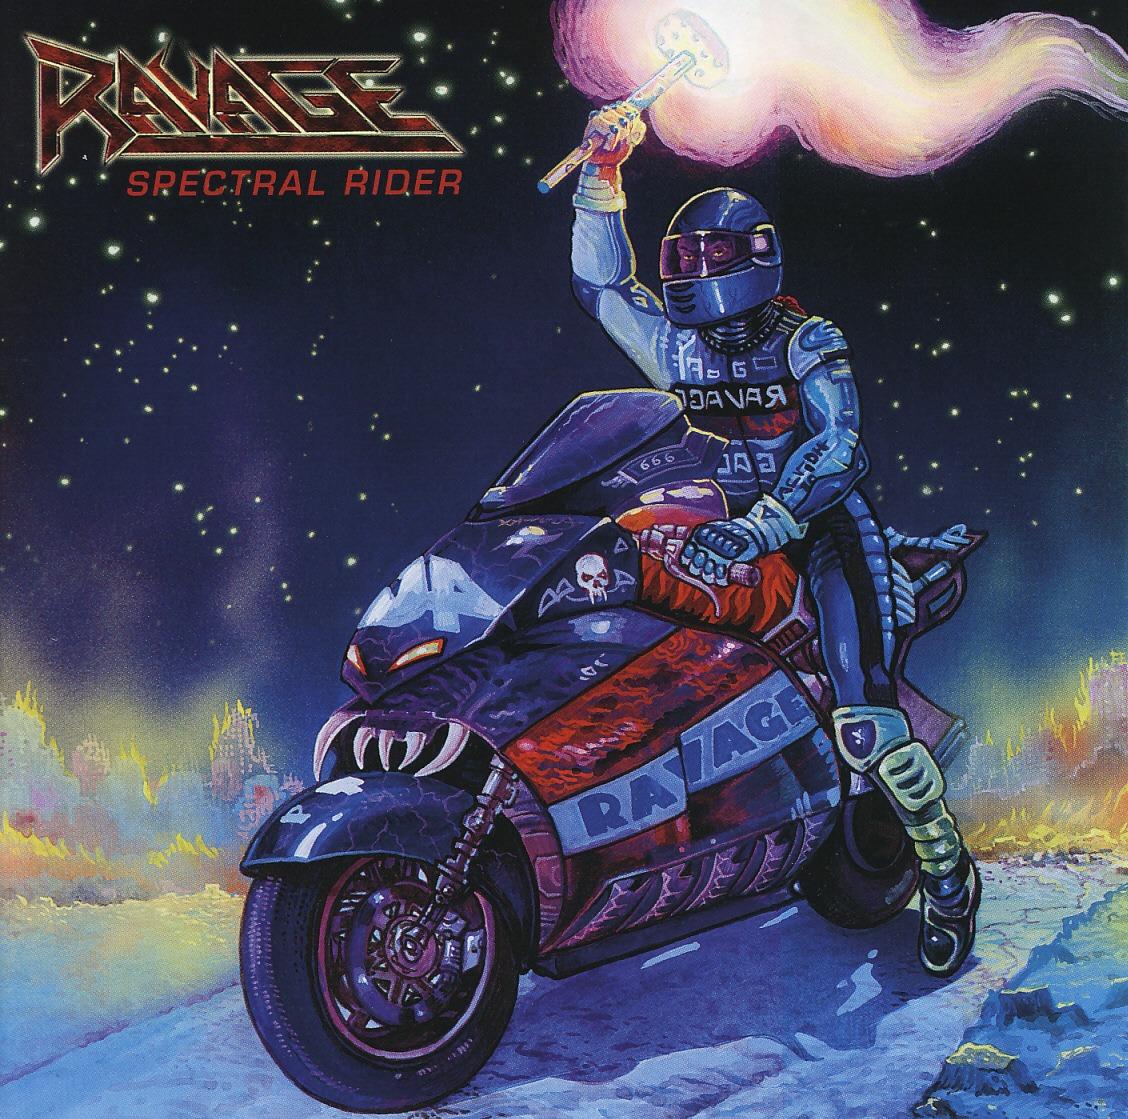 RAVAGE (US/Boston) / Spectral Rider + 1